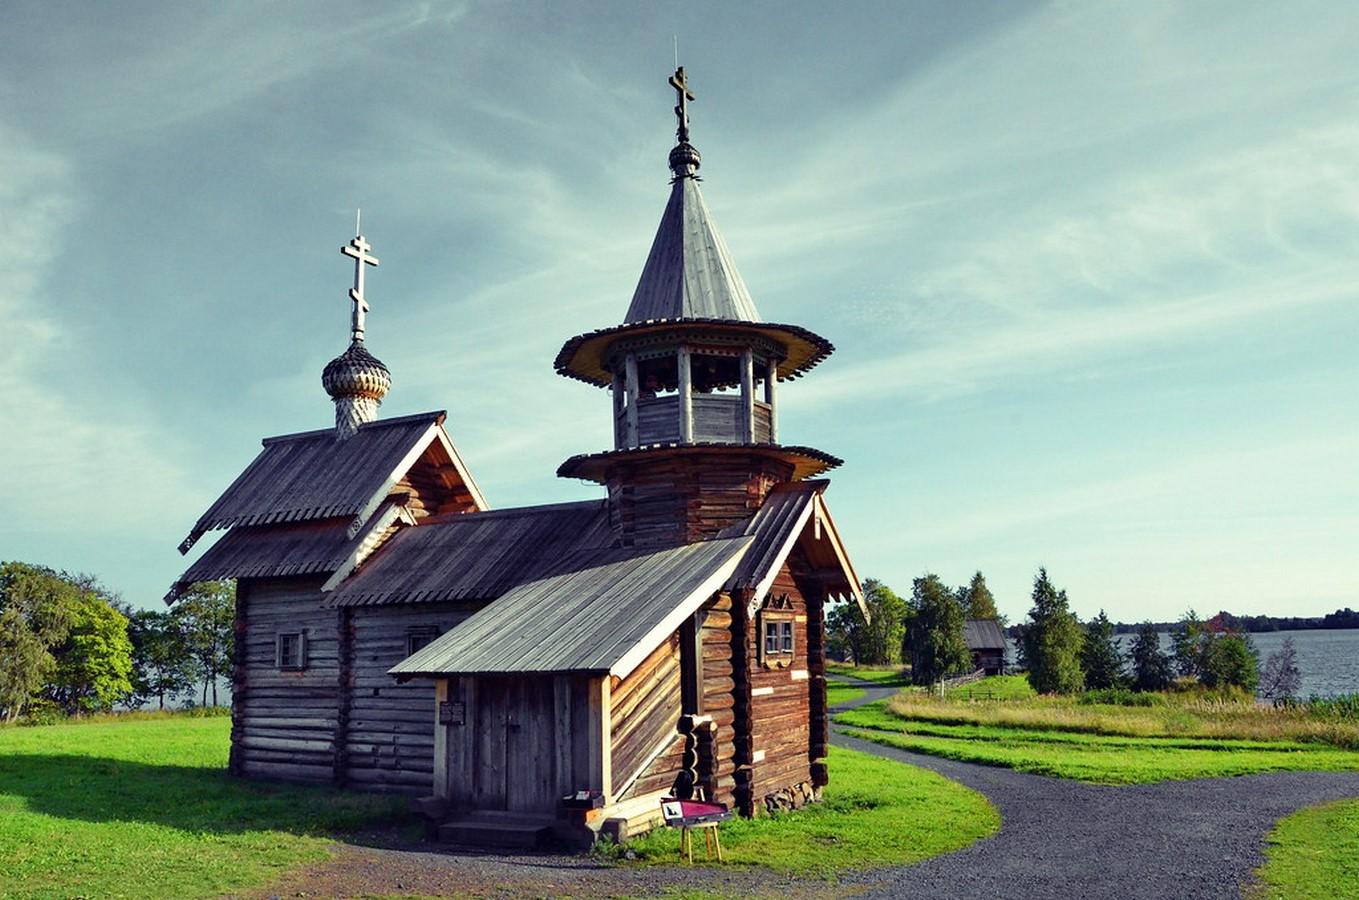 Wooden Architecture of Kizhi Island, Russia - Sheet11